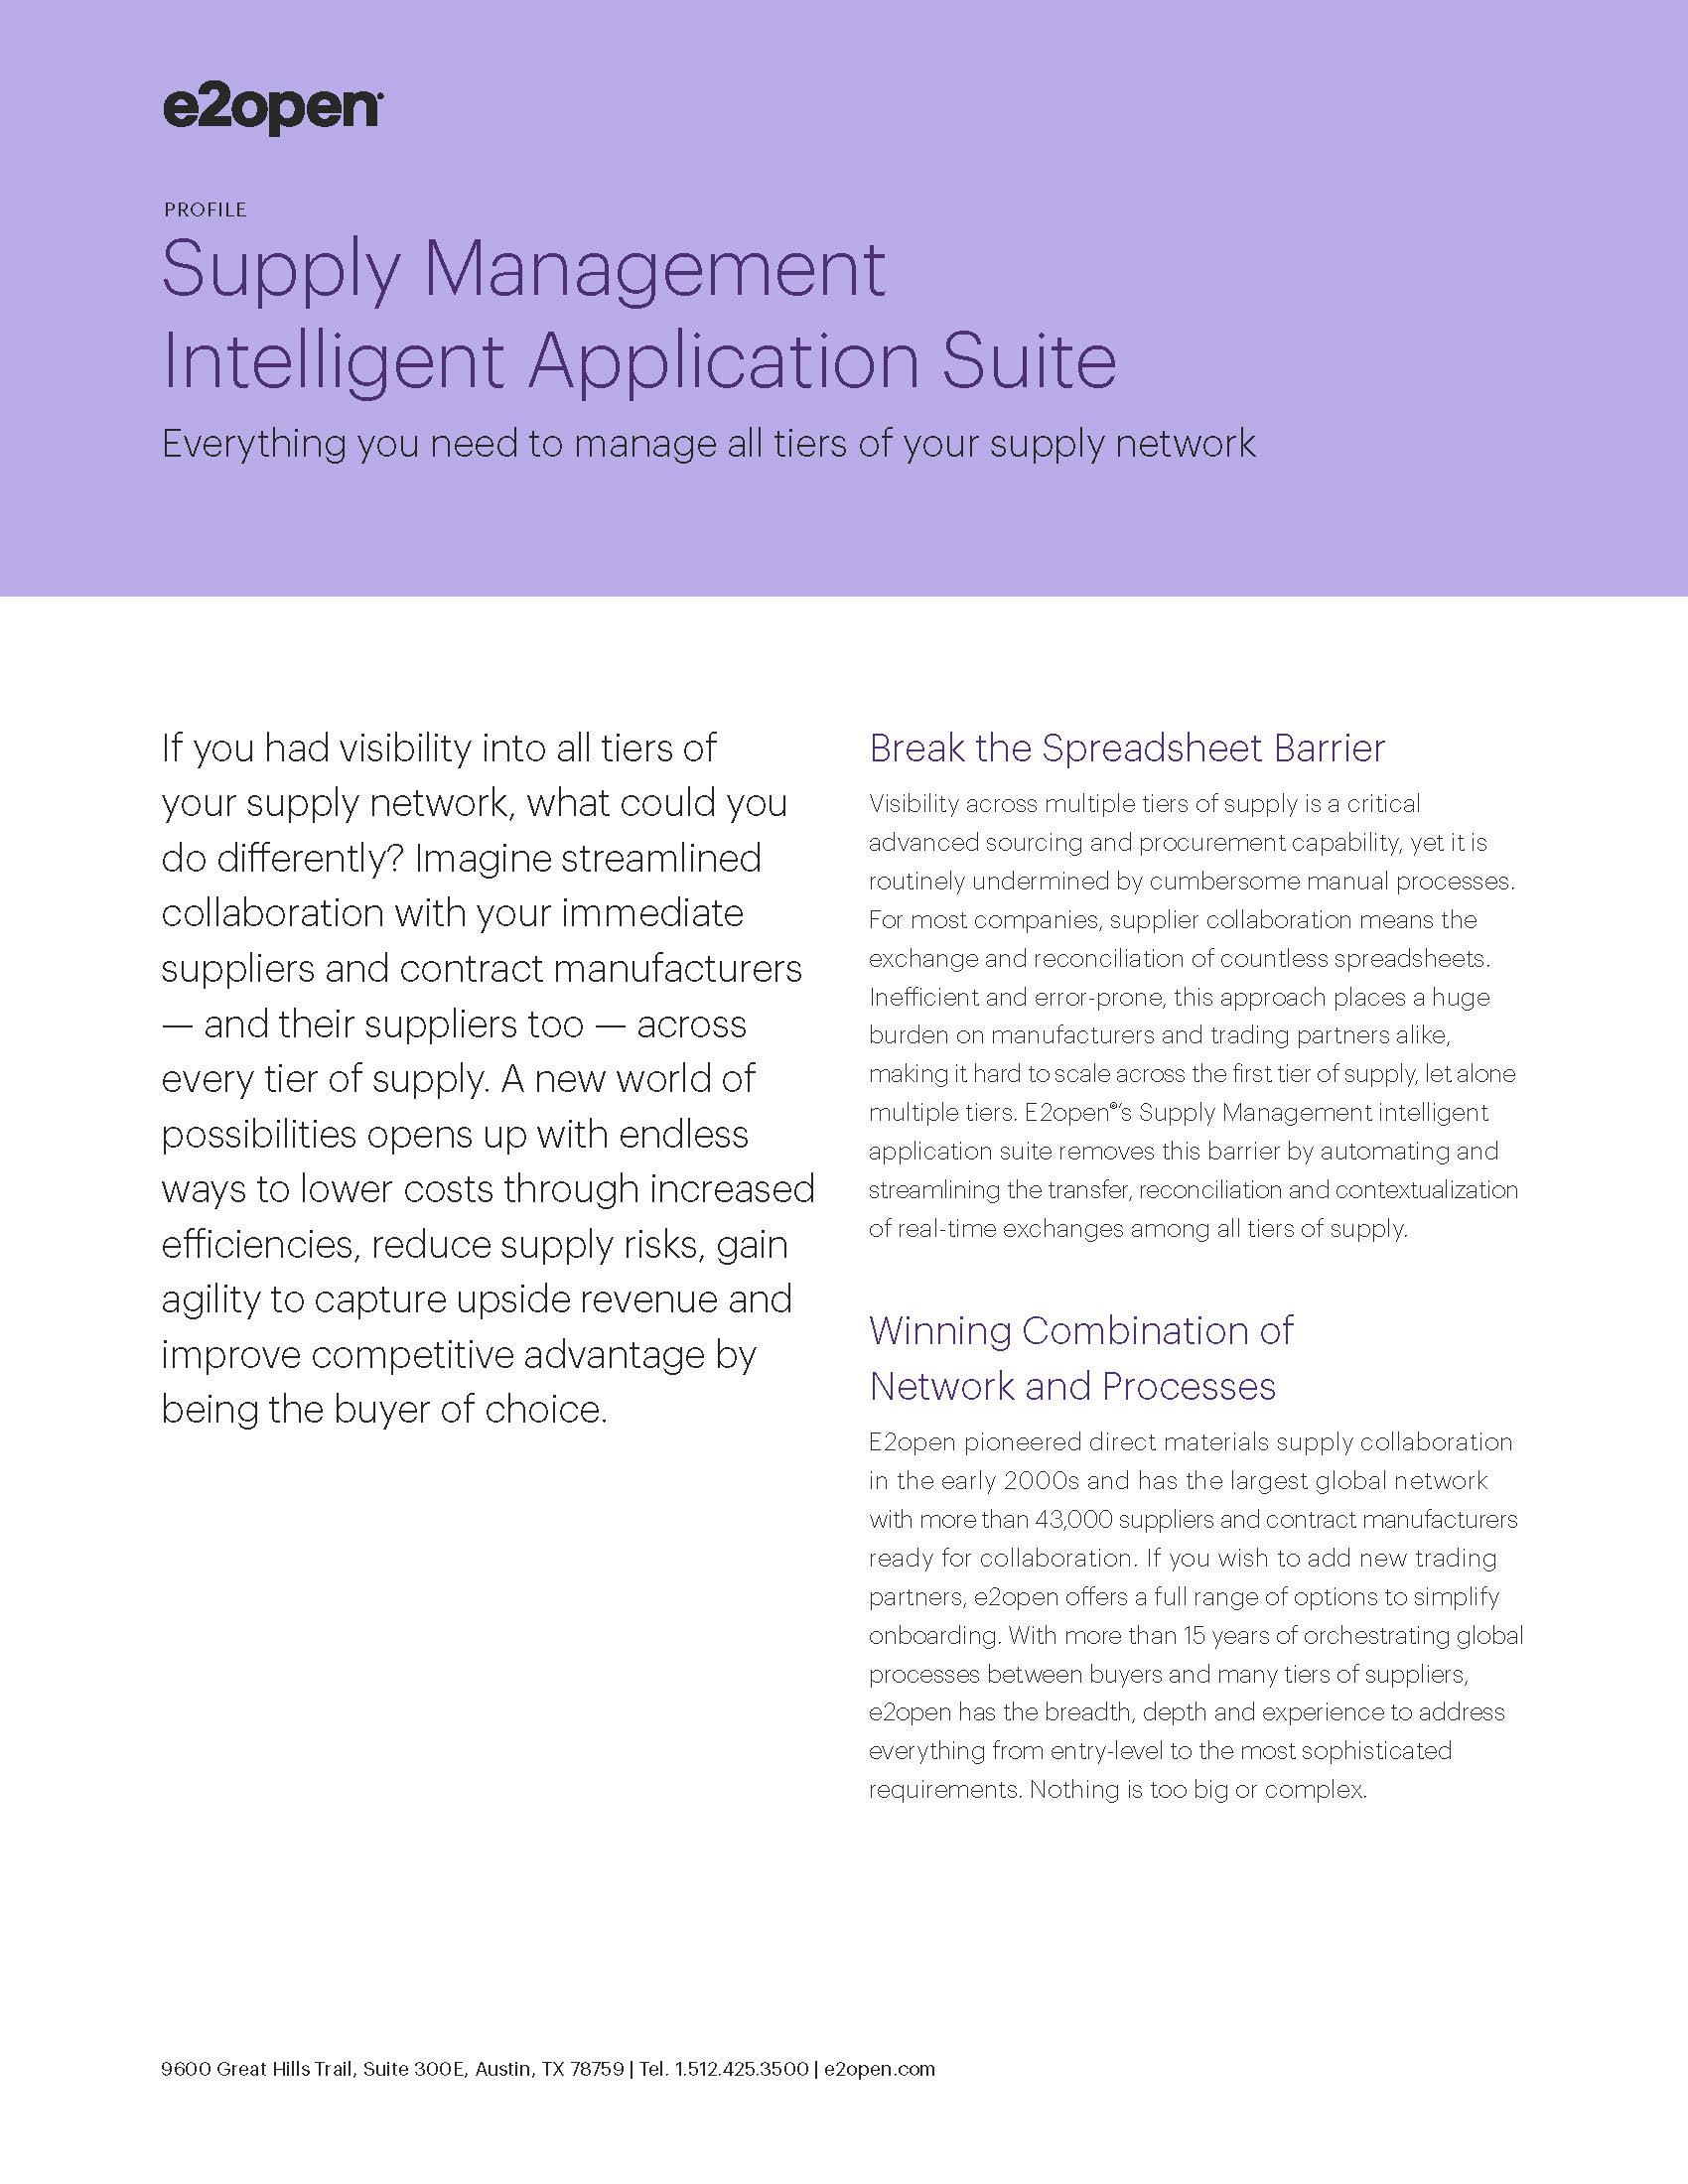 Supply Management Intelligent Application Suite Profile